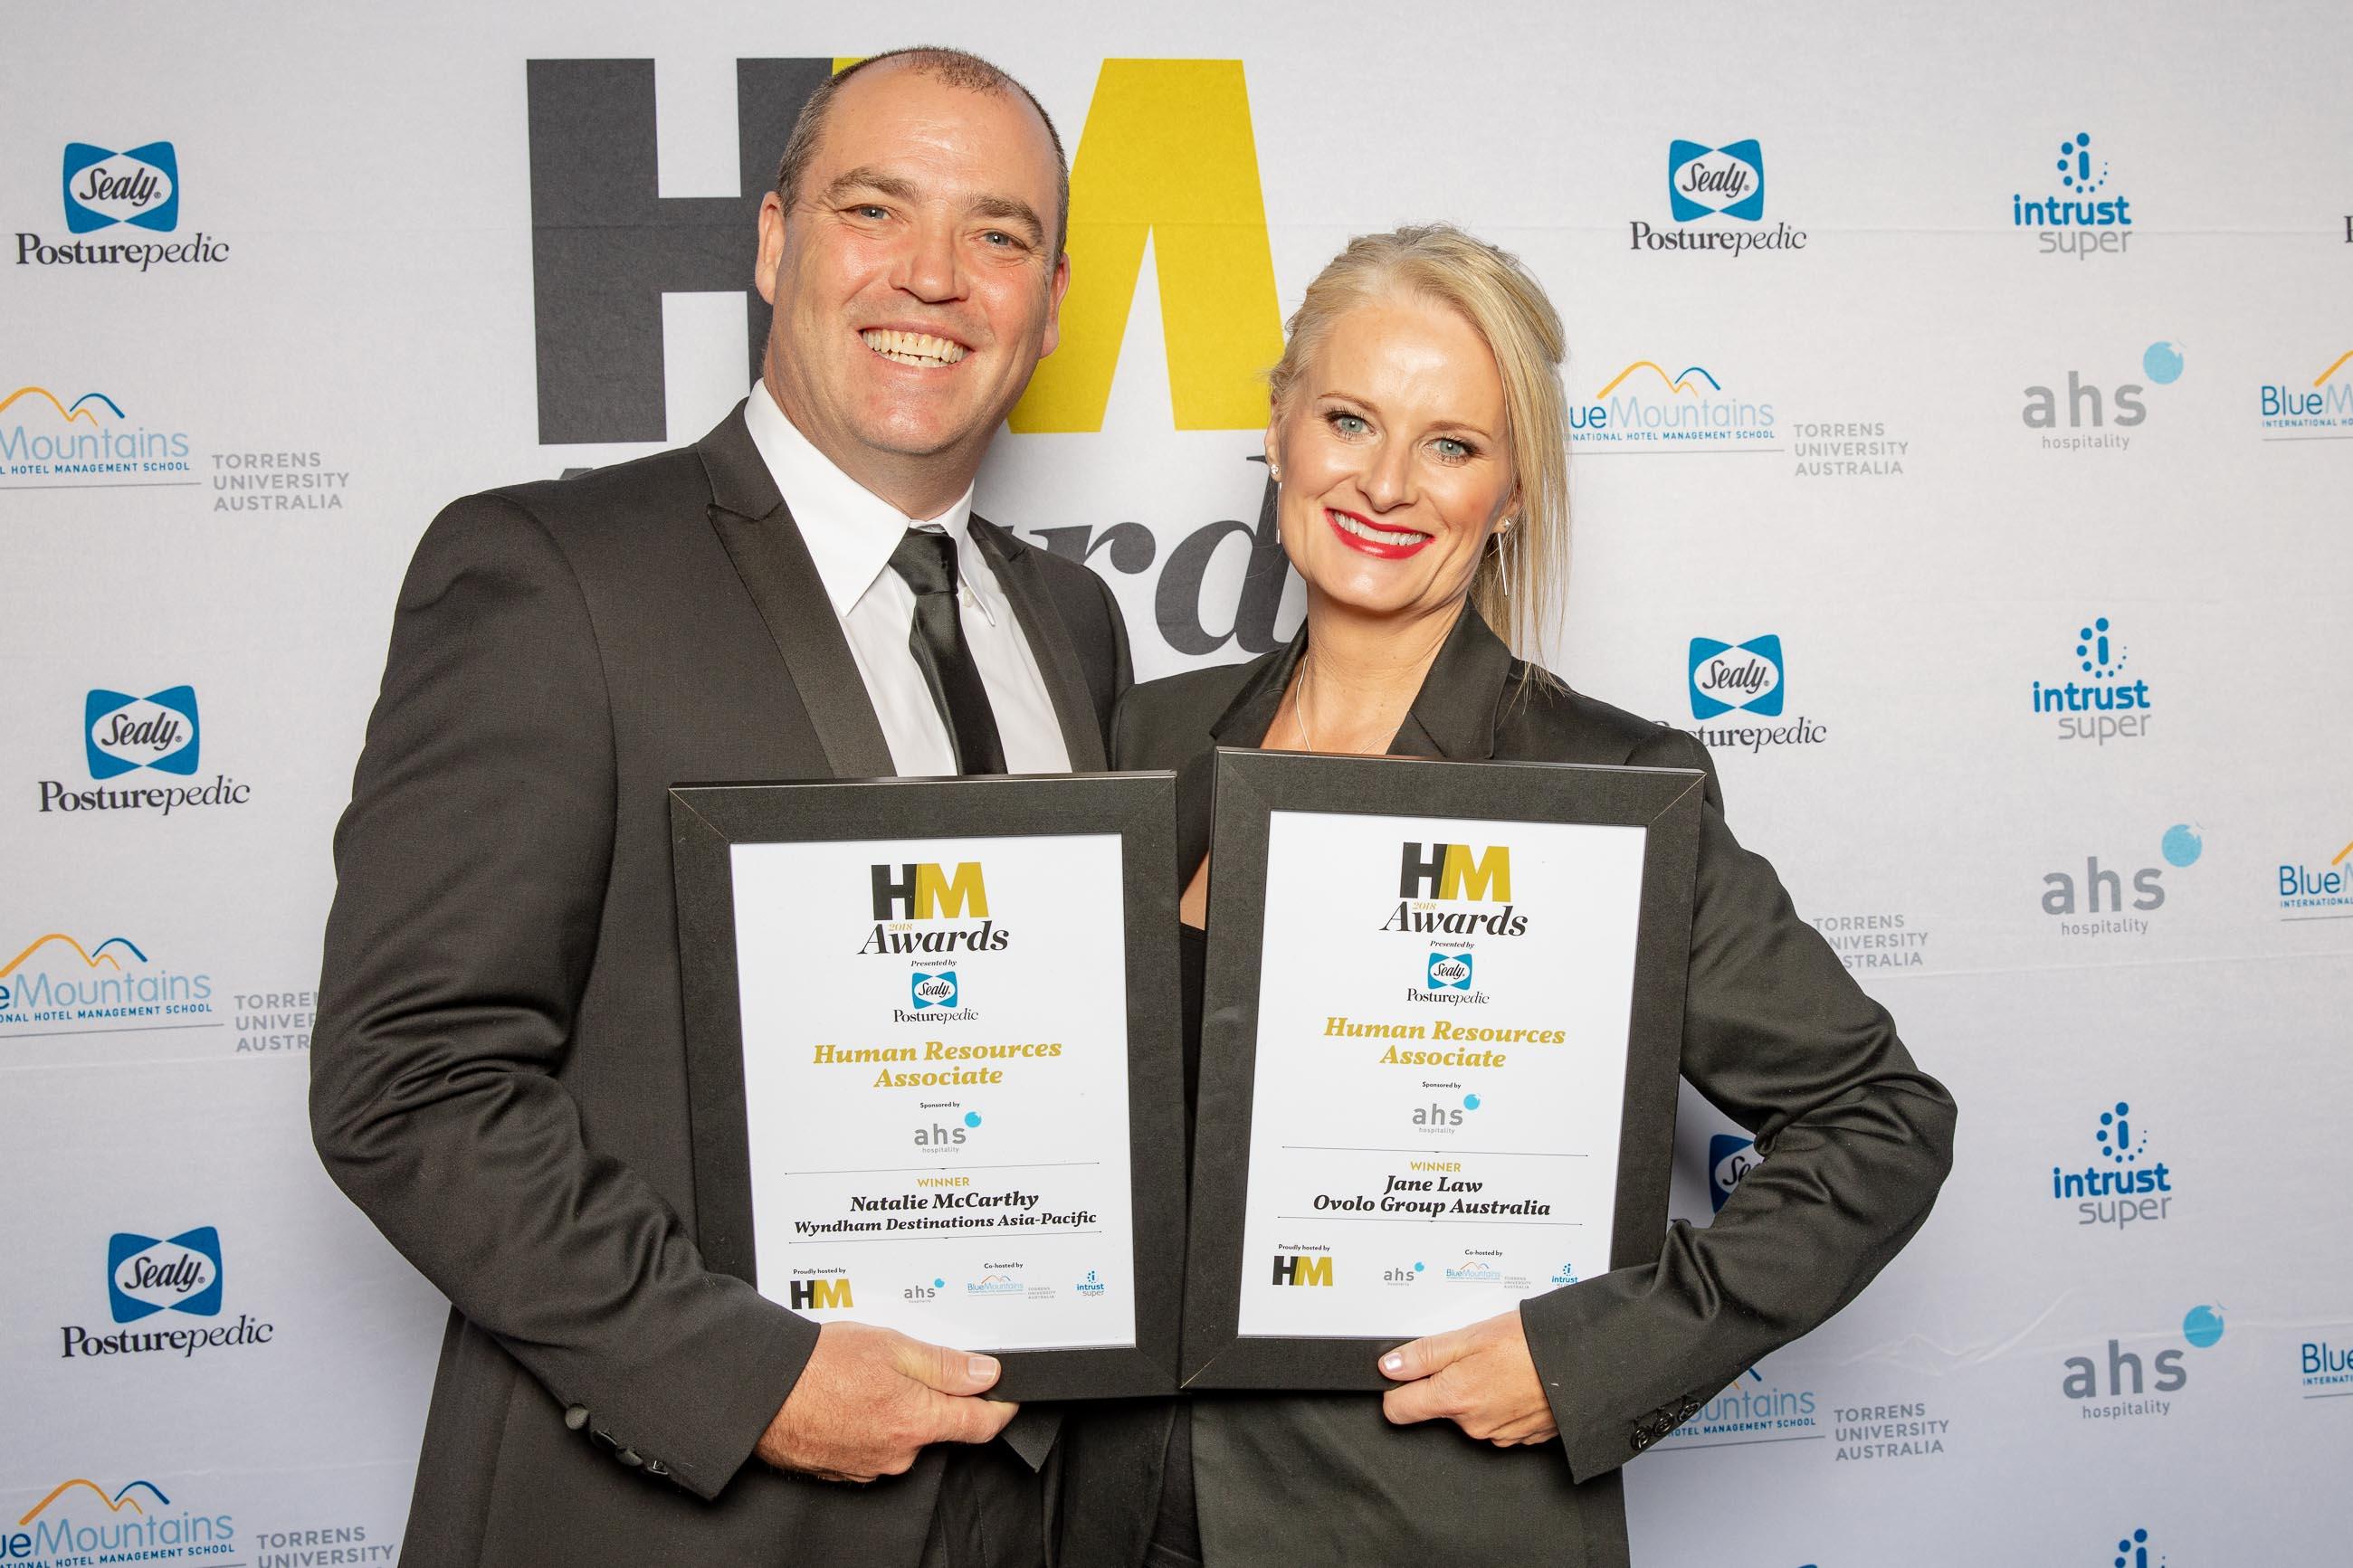 72ppi-HMawards-2018-official-award-wall-179179